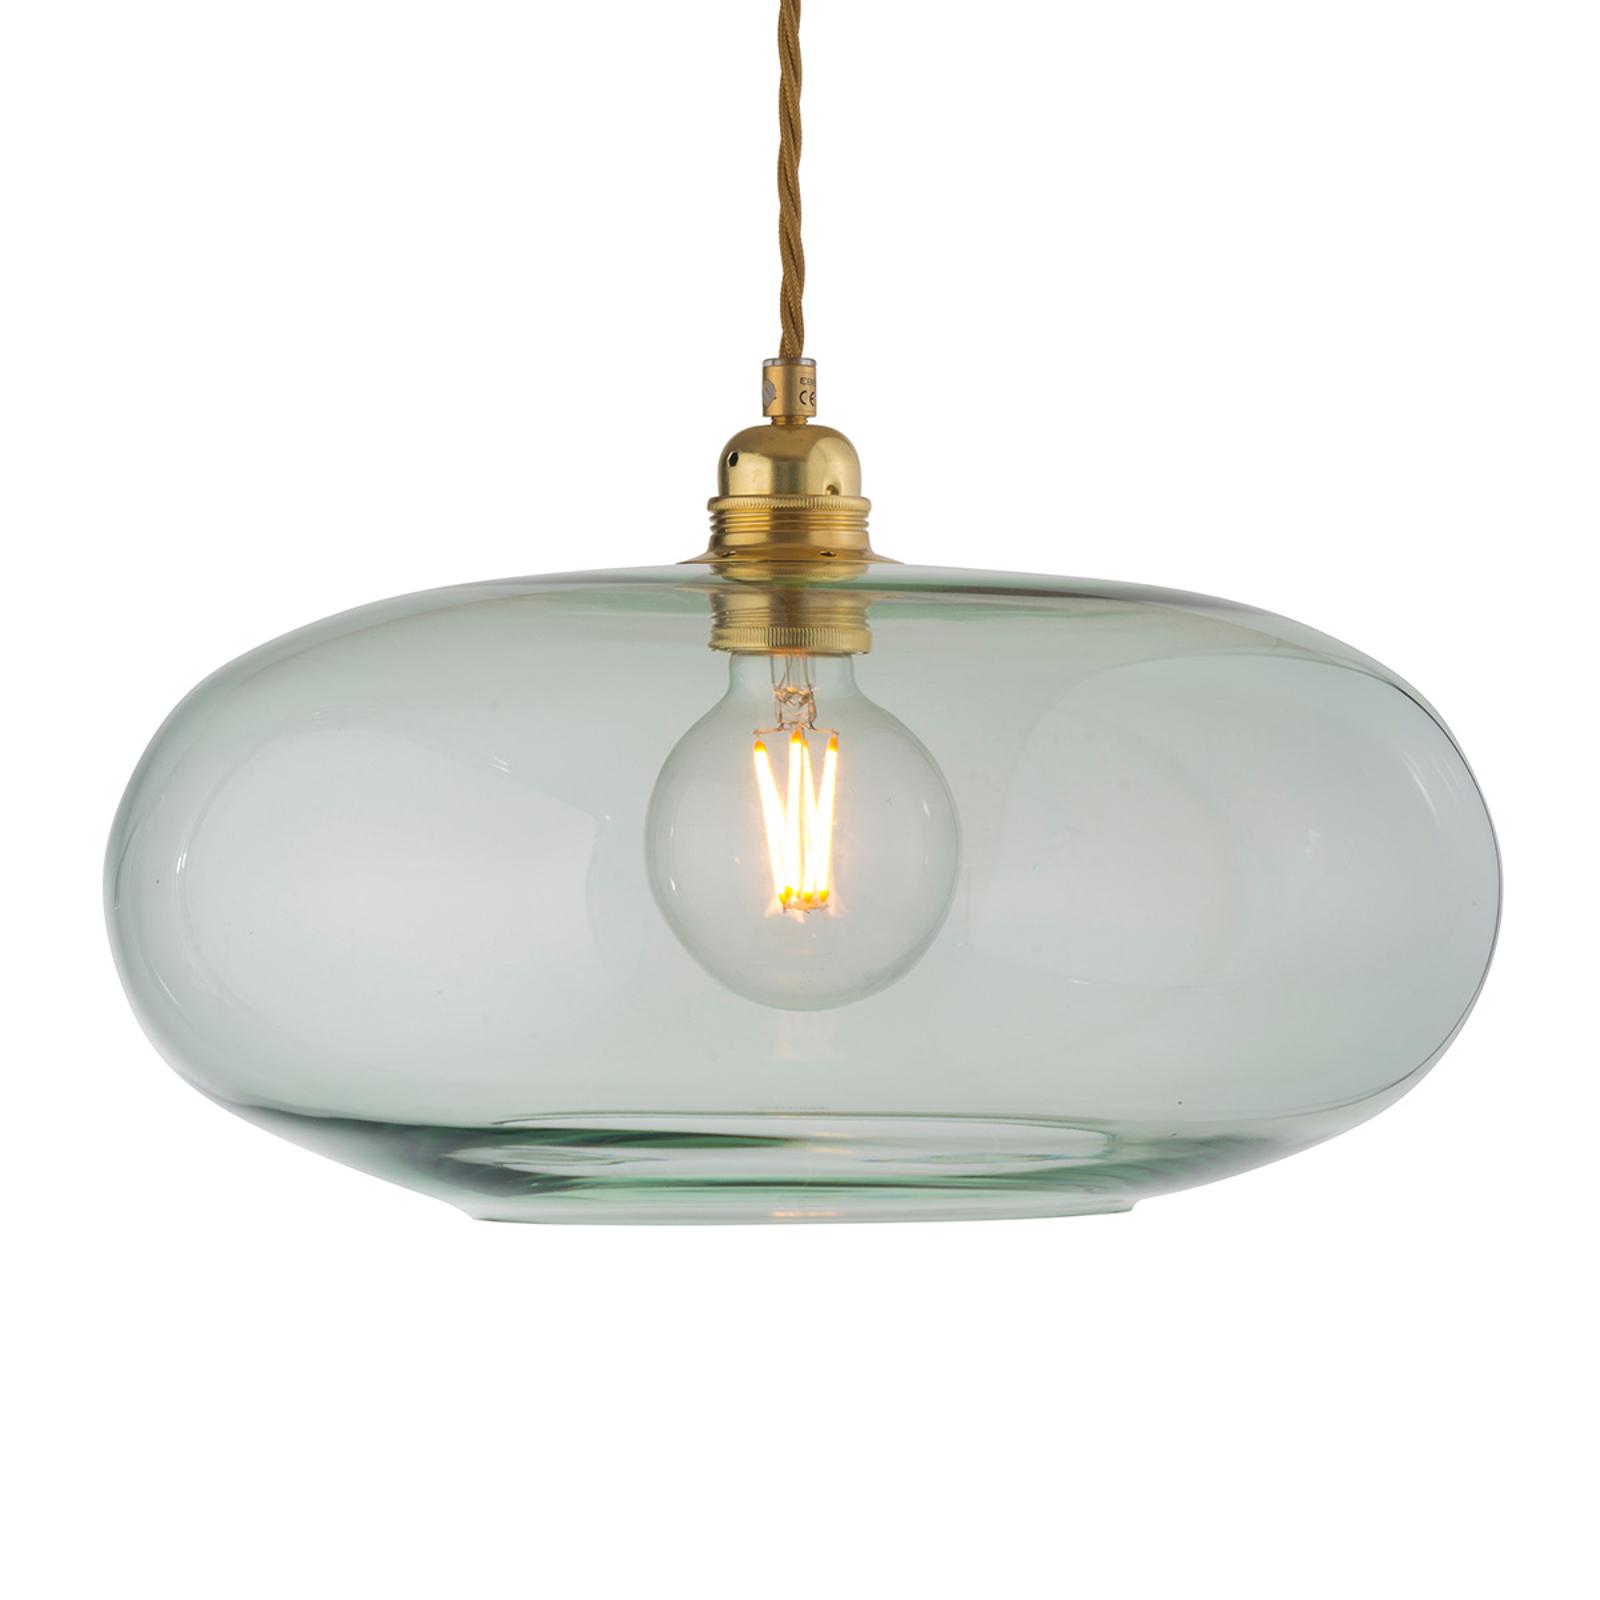 EBB & FLOW Horizon glas-hanglamp groen Ø 36 cm